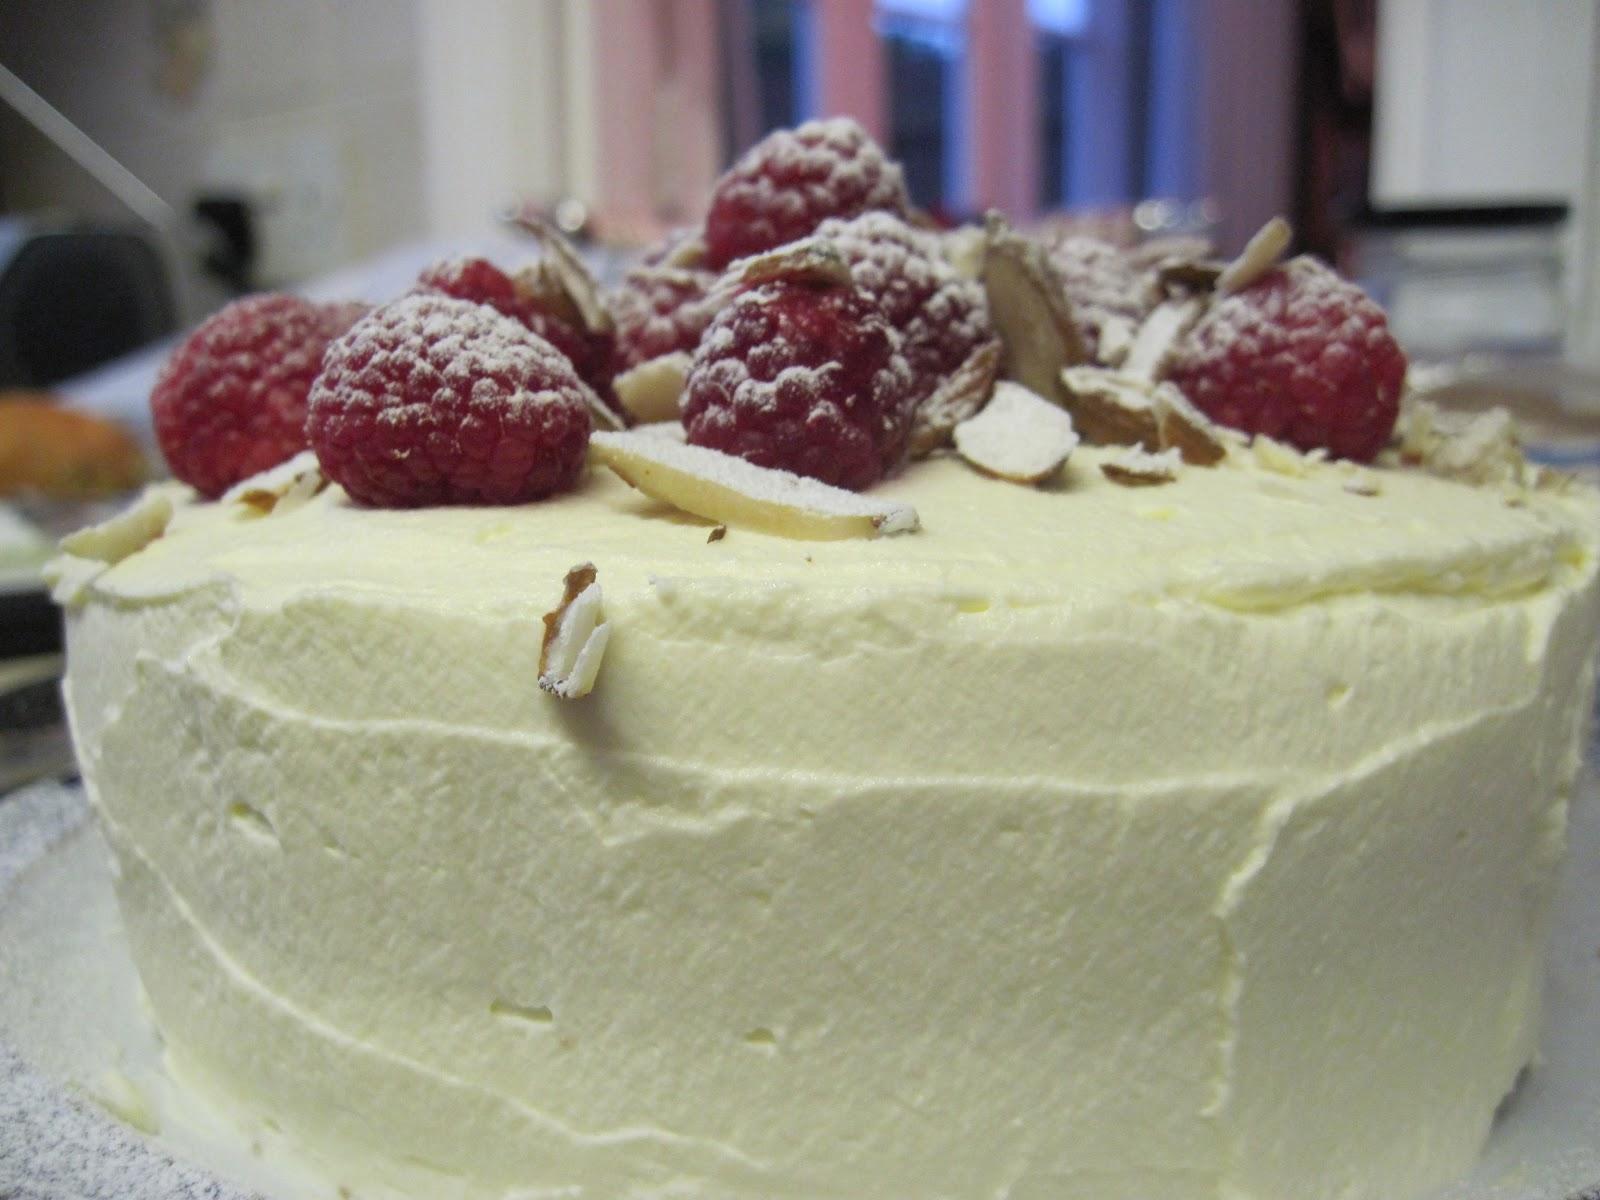 The Sugar Lump Raspberry Bakewell Cake